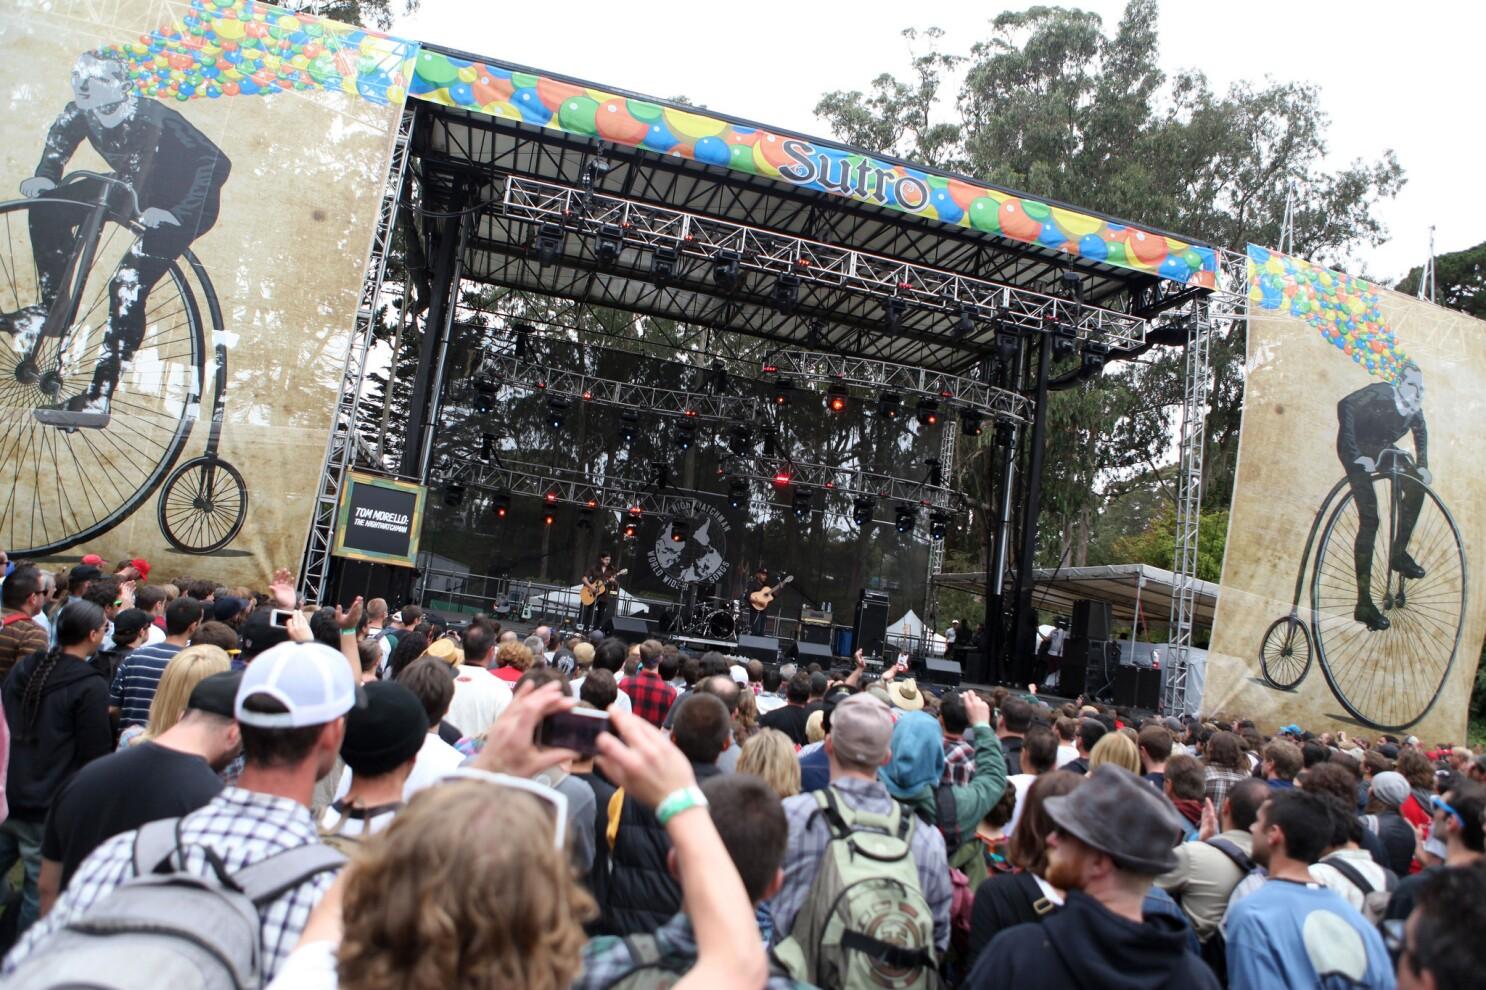 Cannabis sales OK'ed at San Francisco's Outside Lands festival